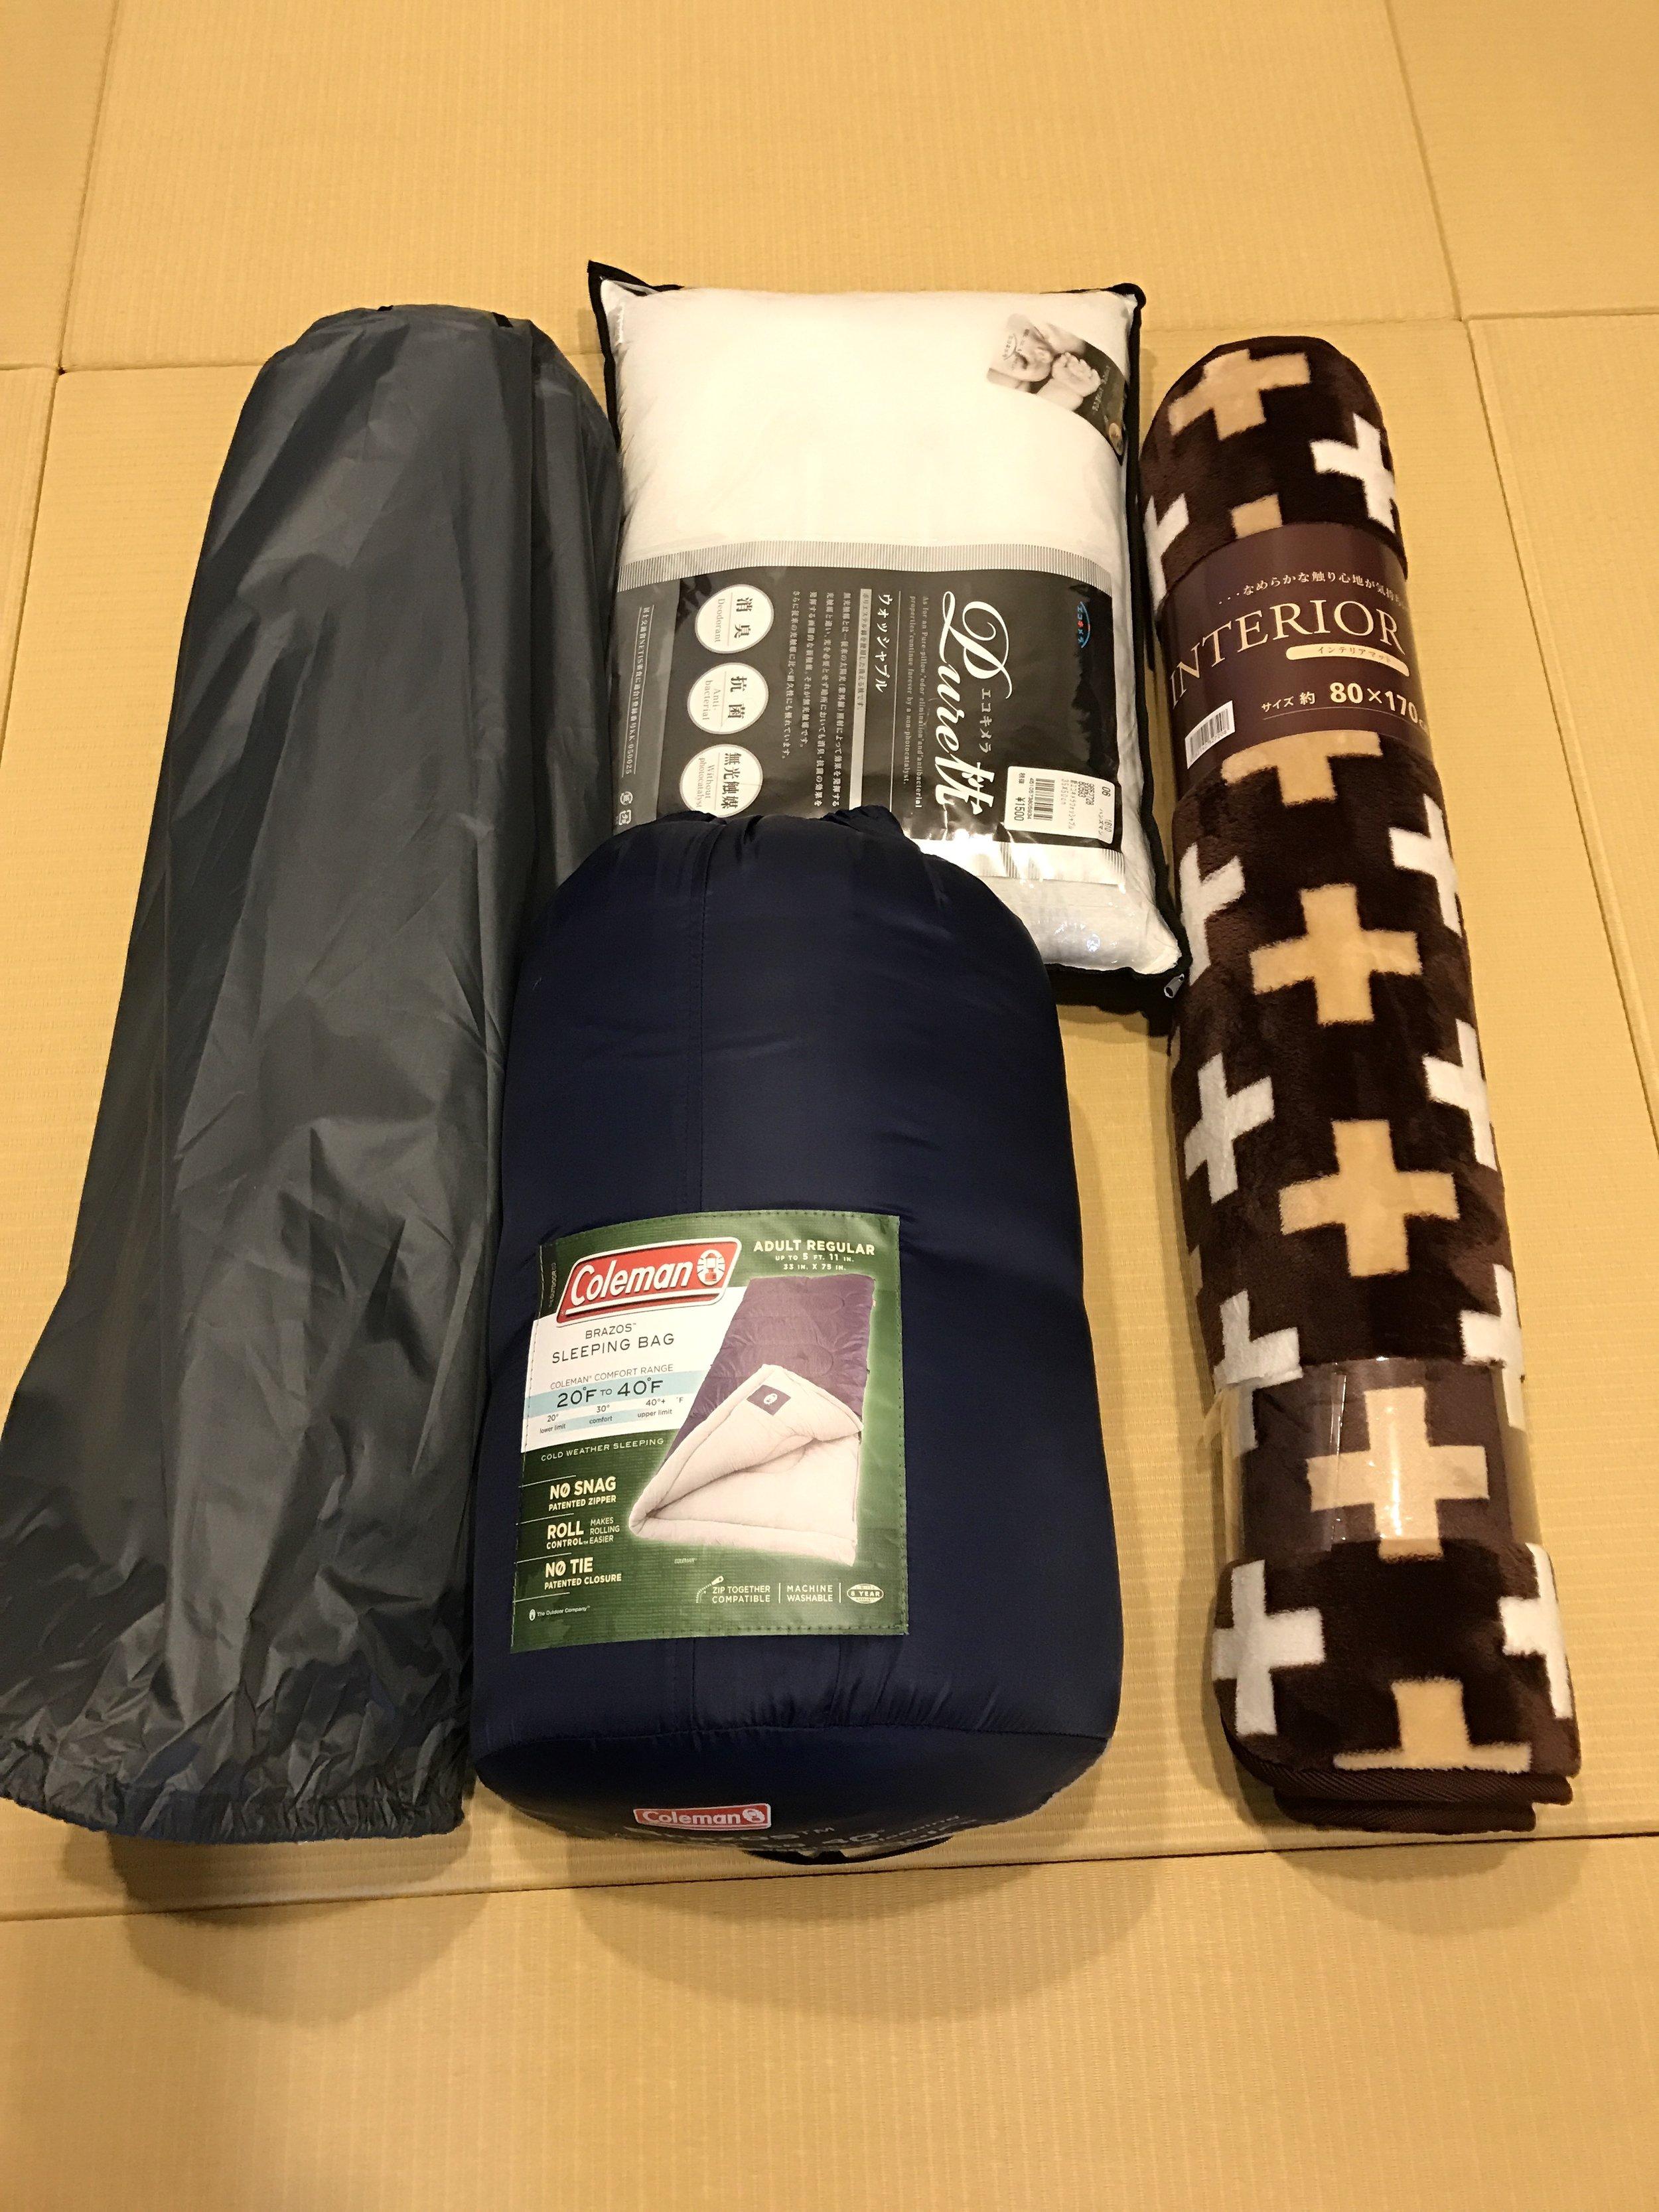 Tesla Models S sleeping set: air mattresses, sleeping bag, pillow and mat.